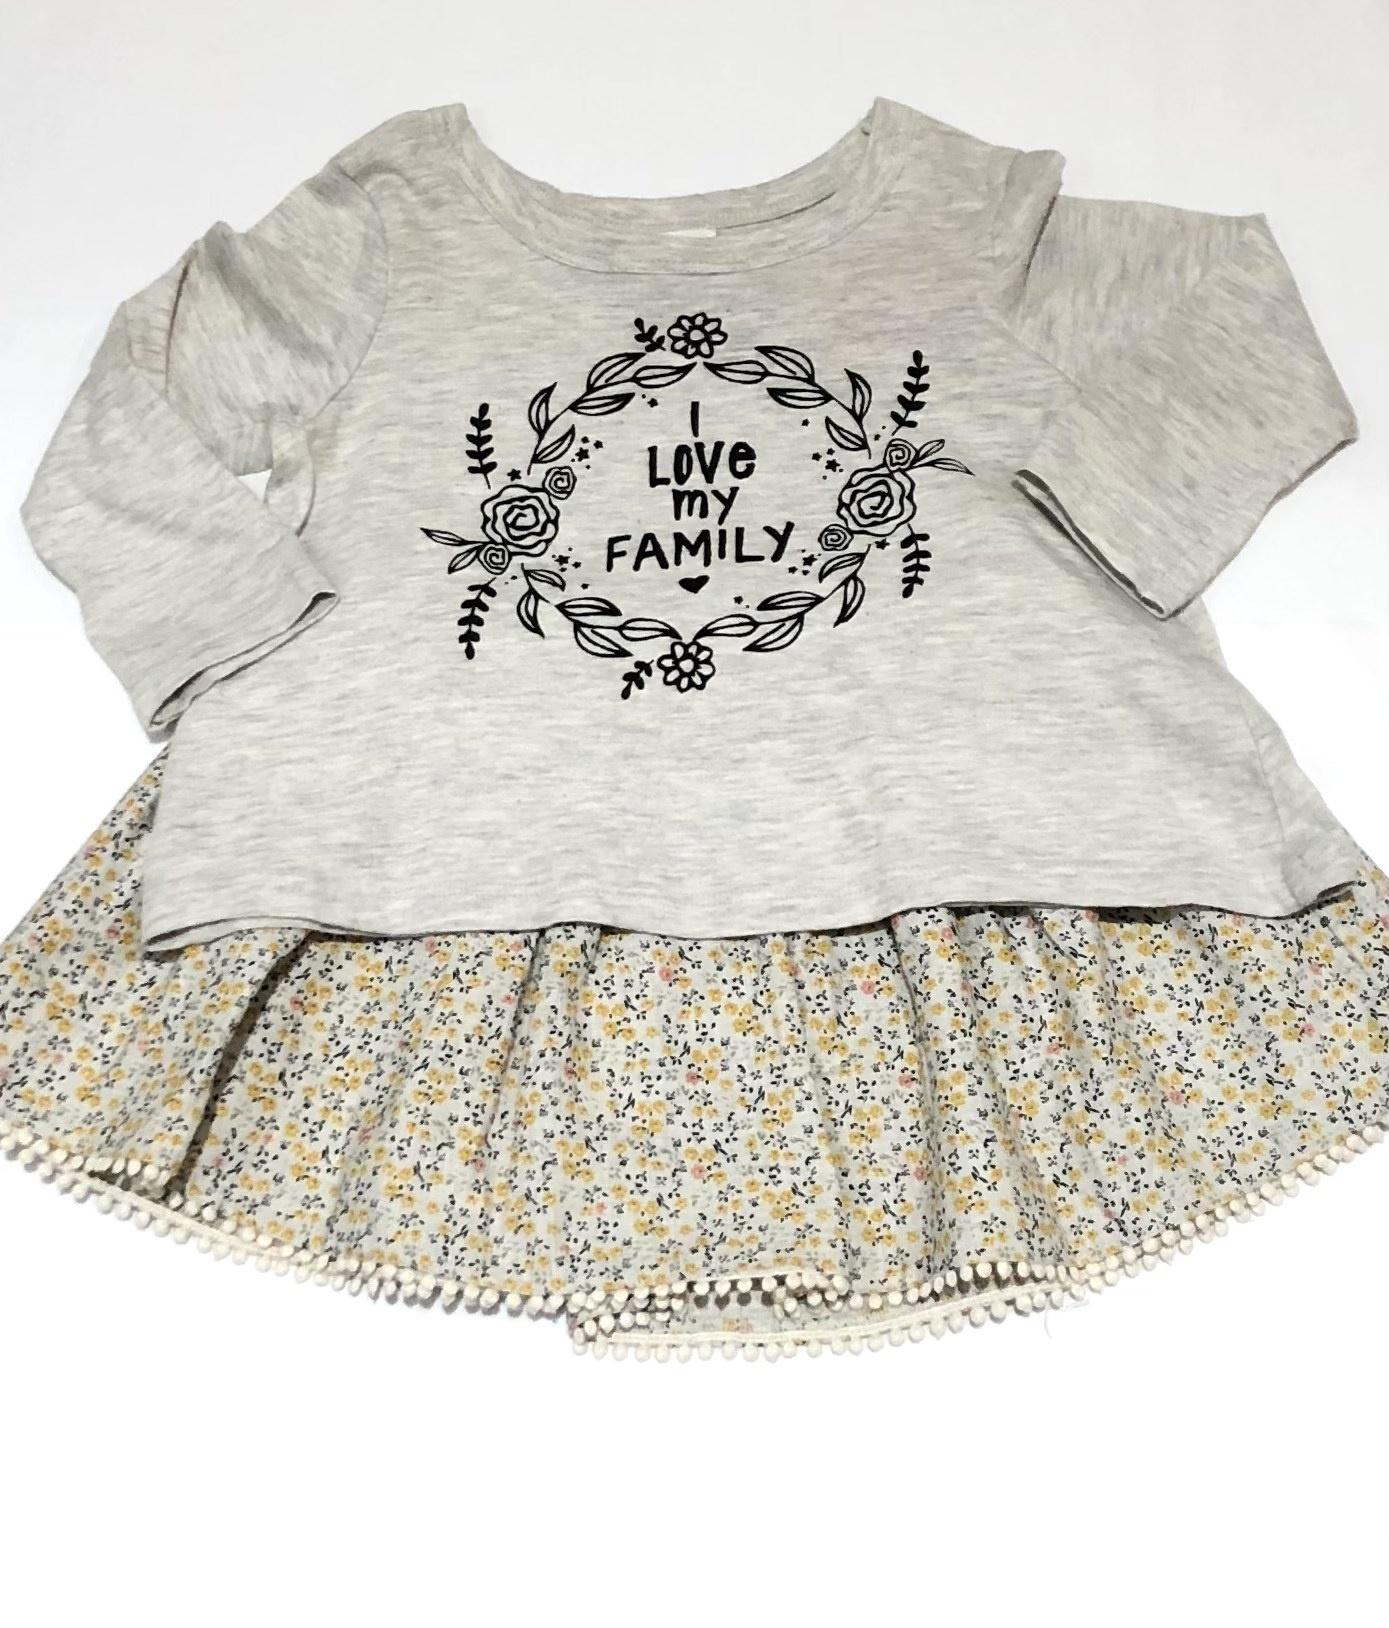 Mimi & Maggie 2341-GRY Filipa Tee/Skirt 2pc Set, Grey